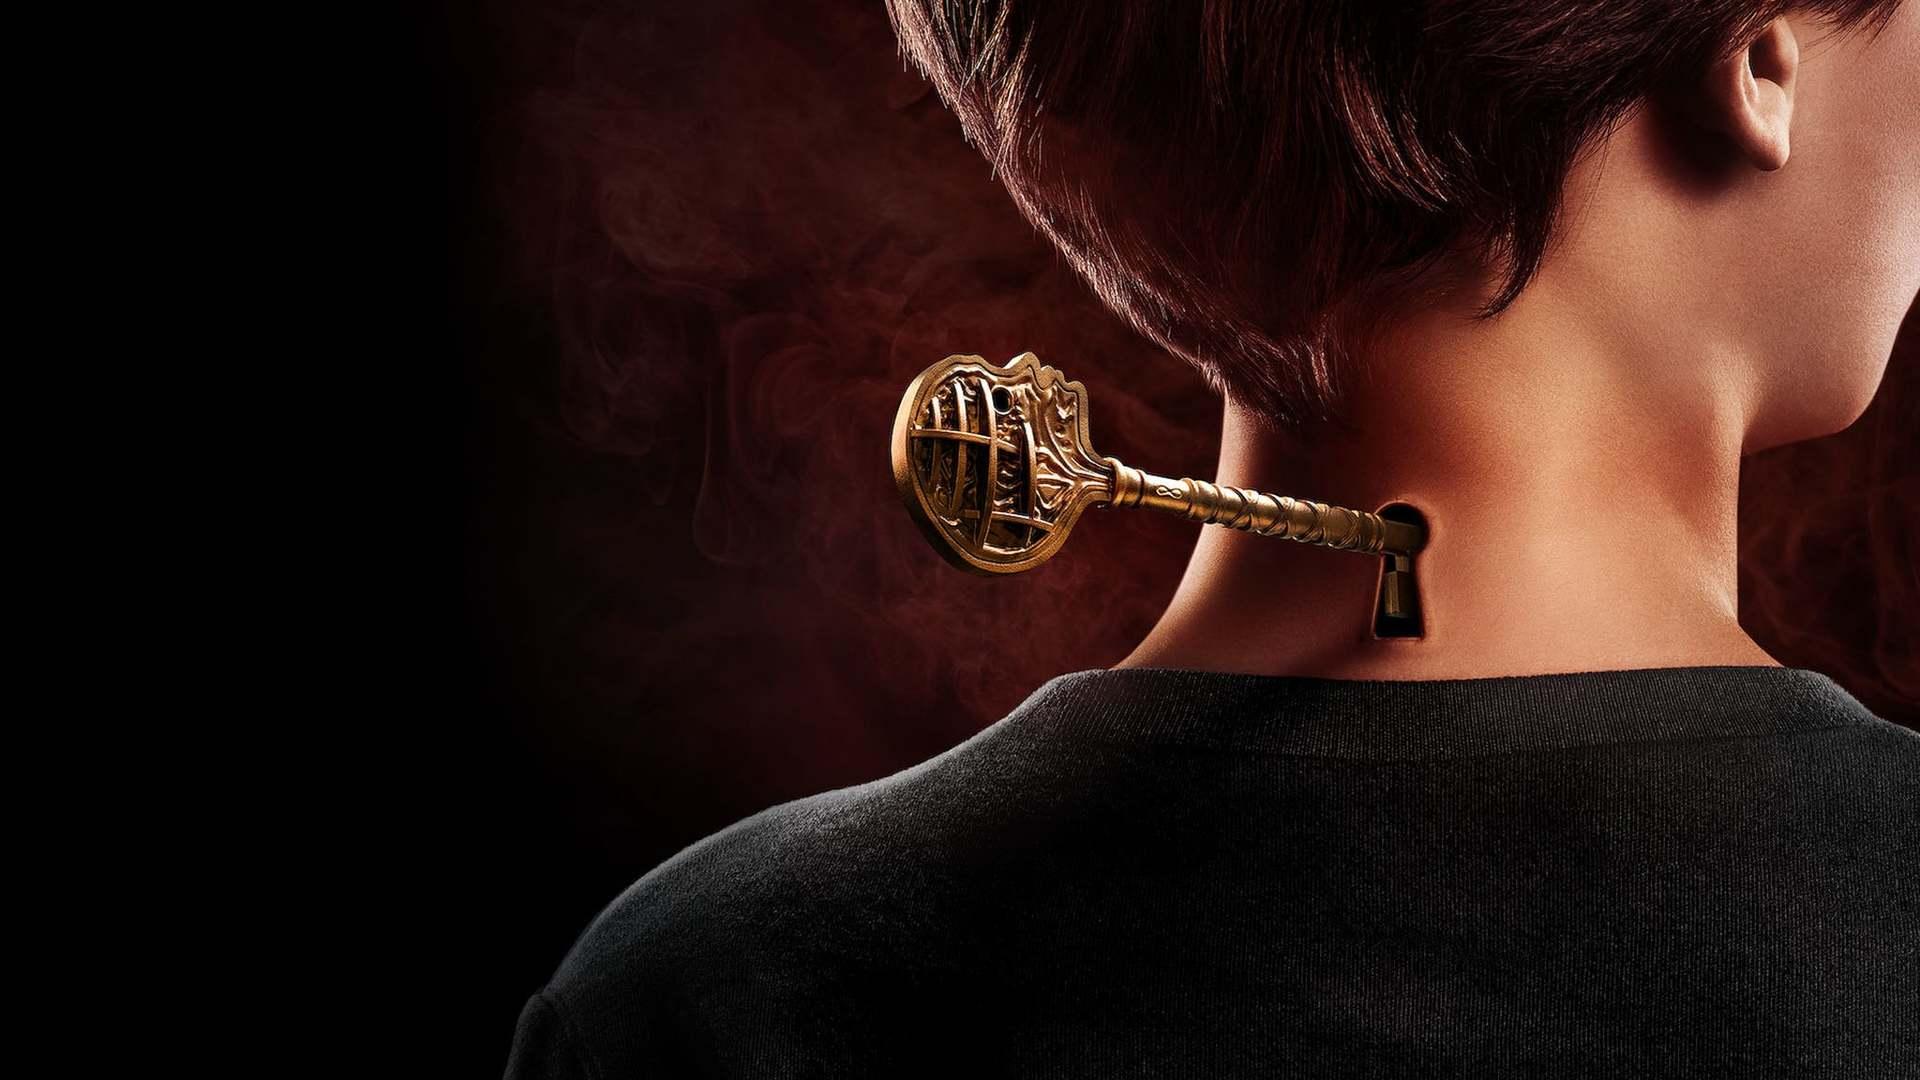 Кадры из фильма Замок и ключ Locke & Key 2020